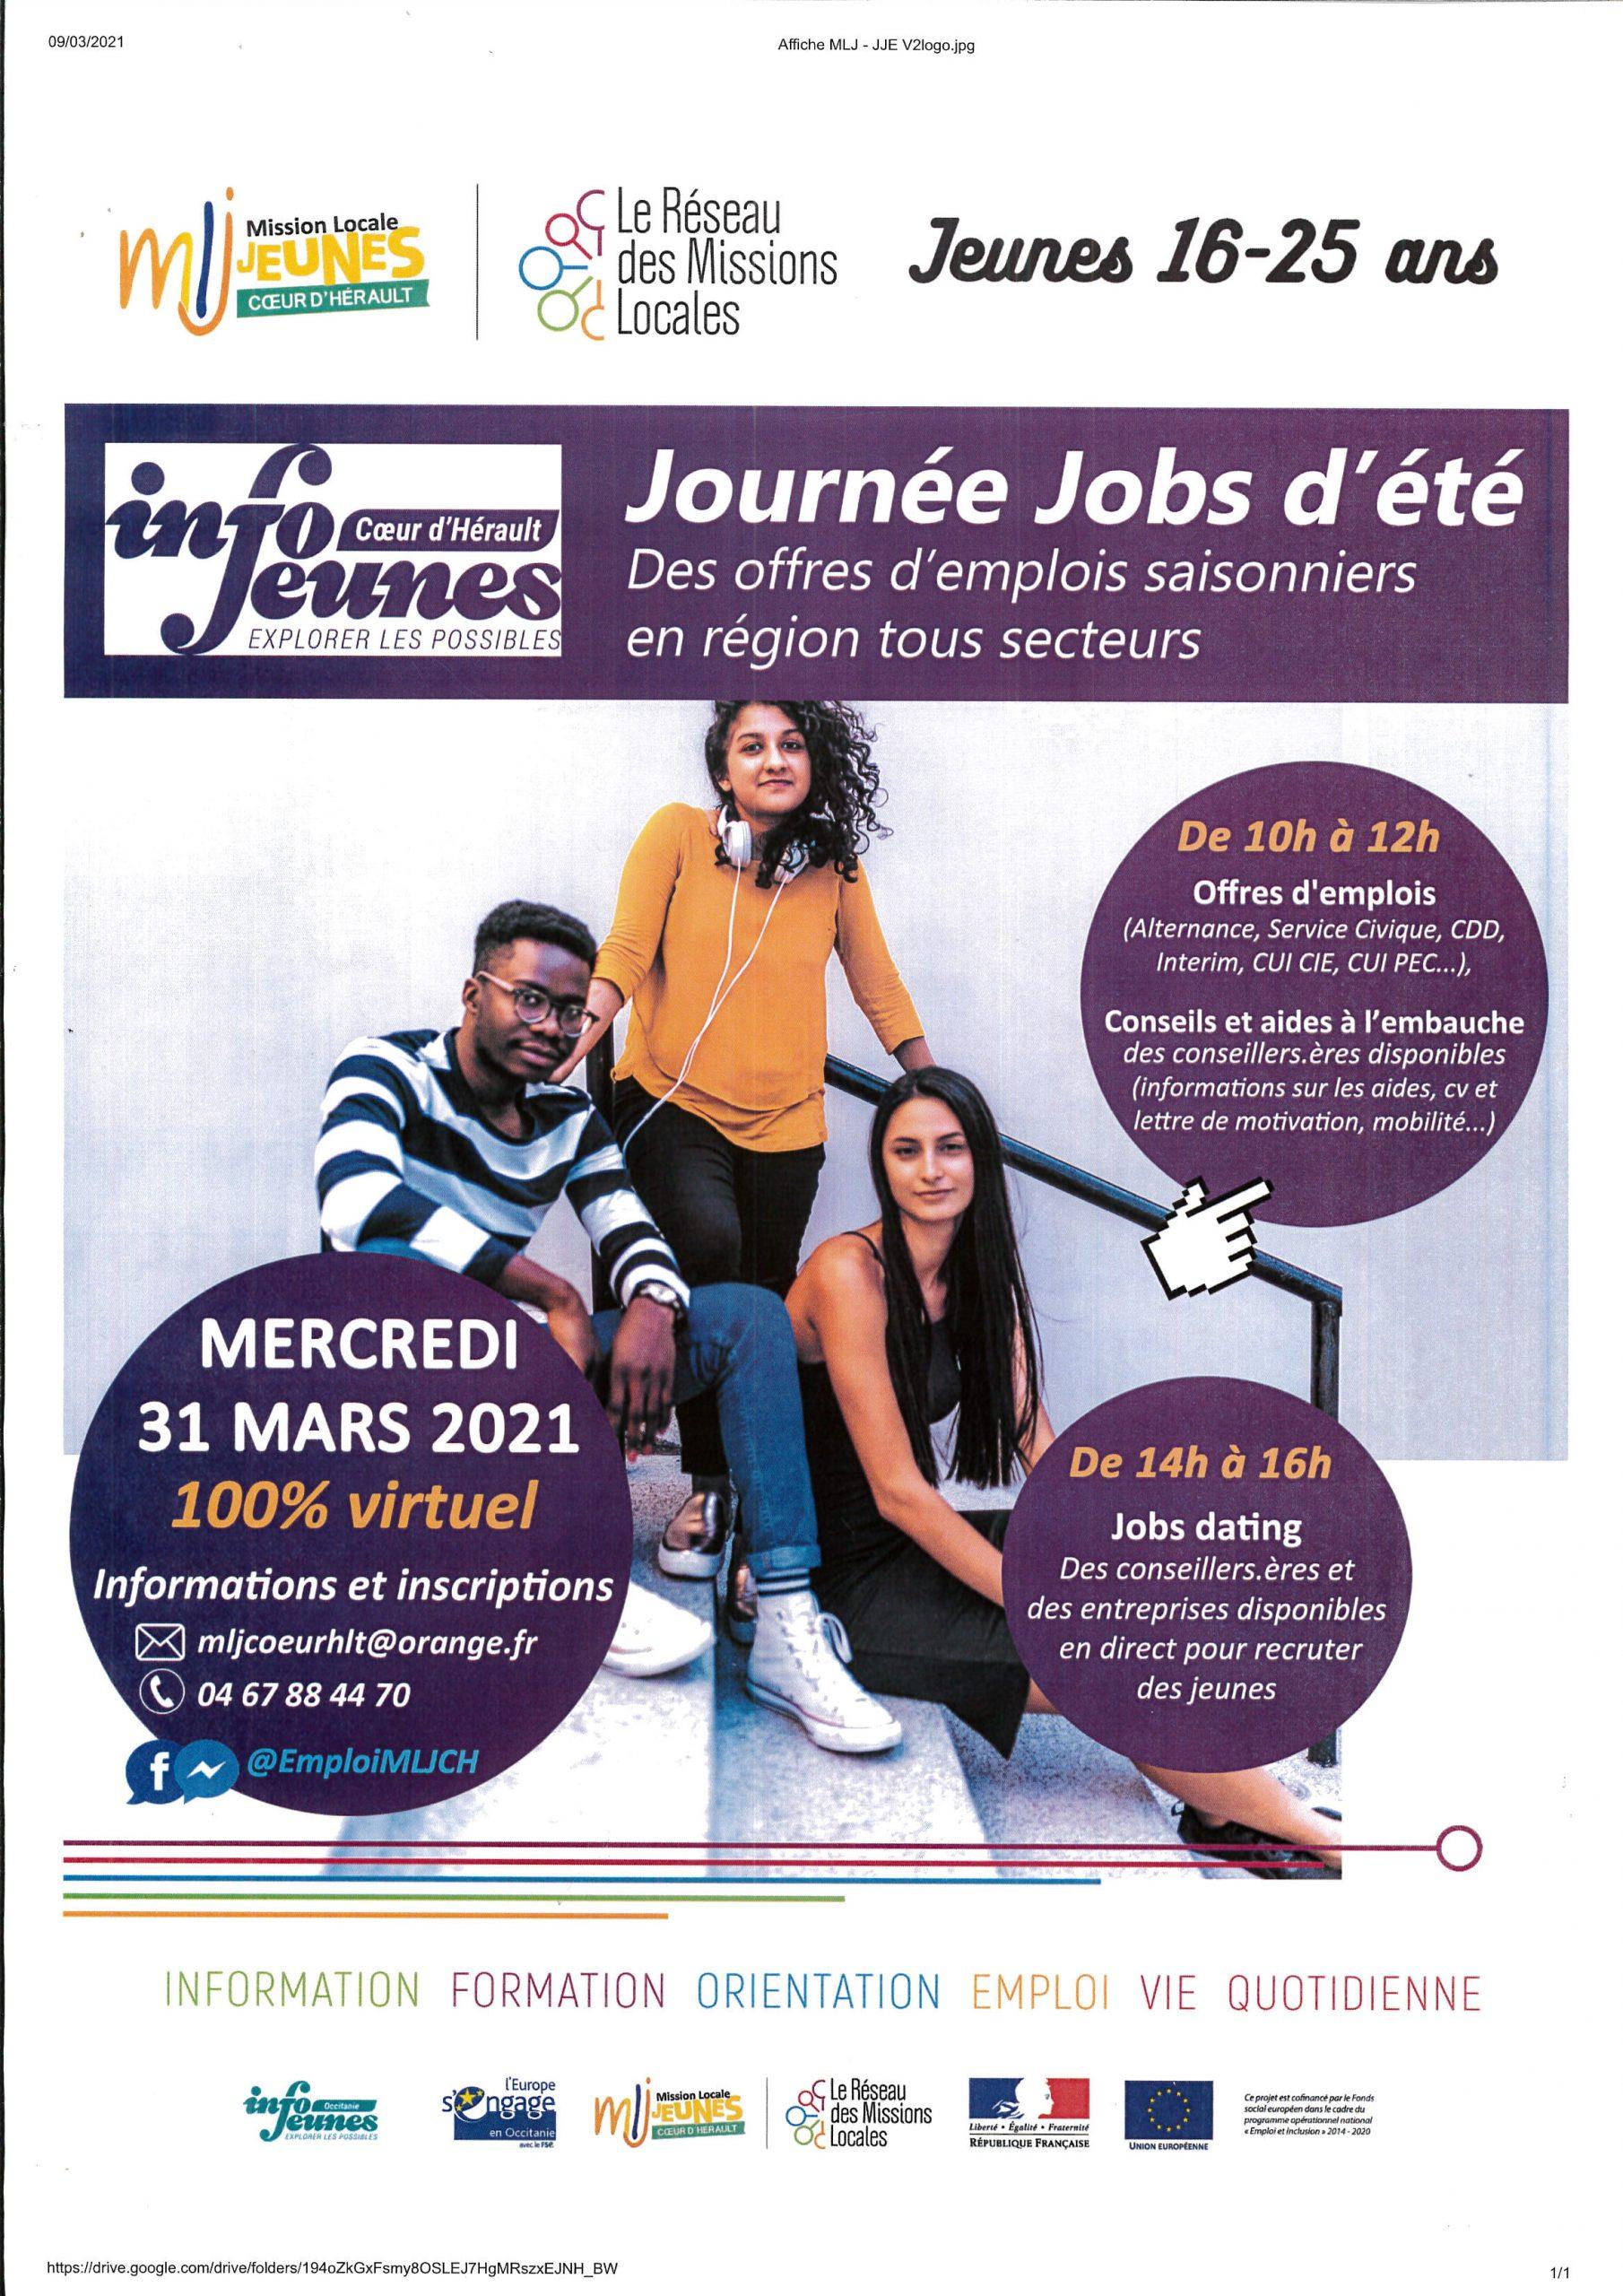 affiche jobs d'été